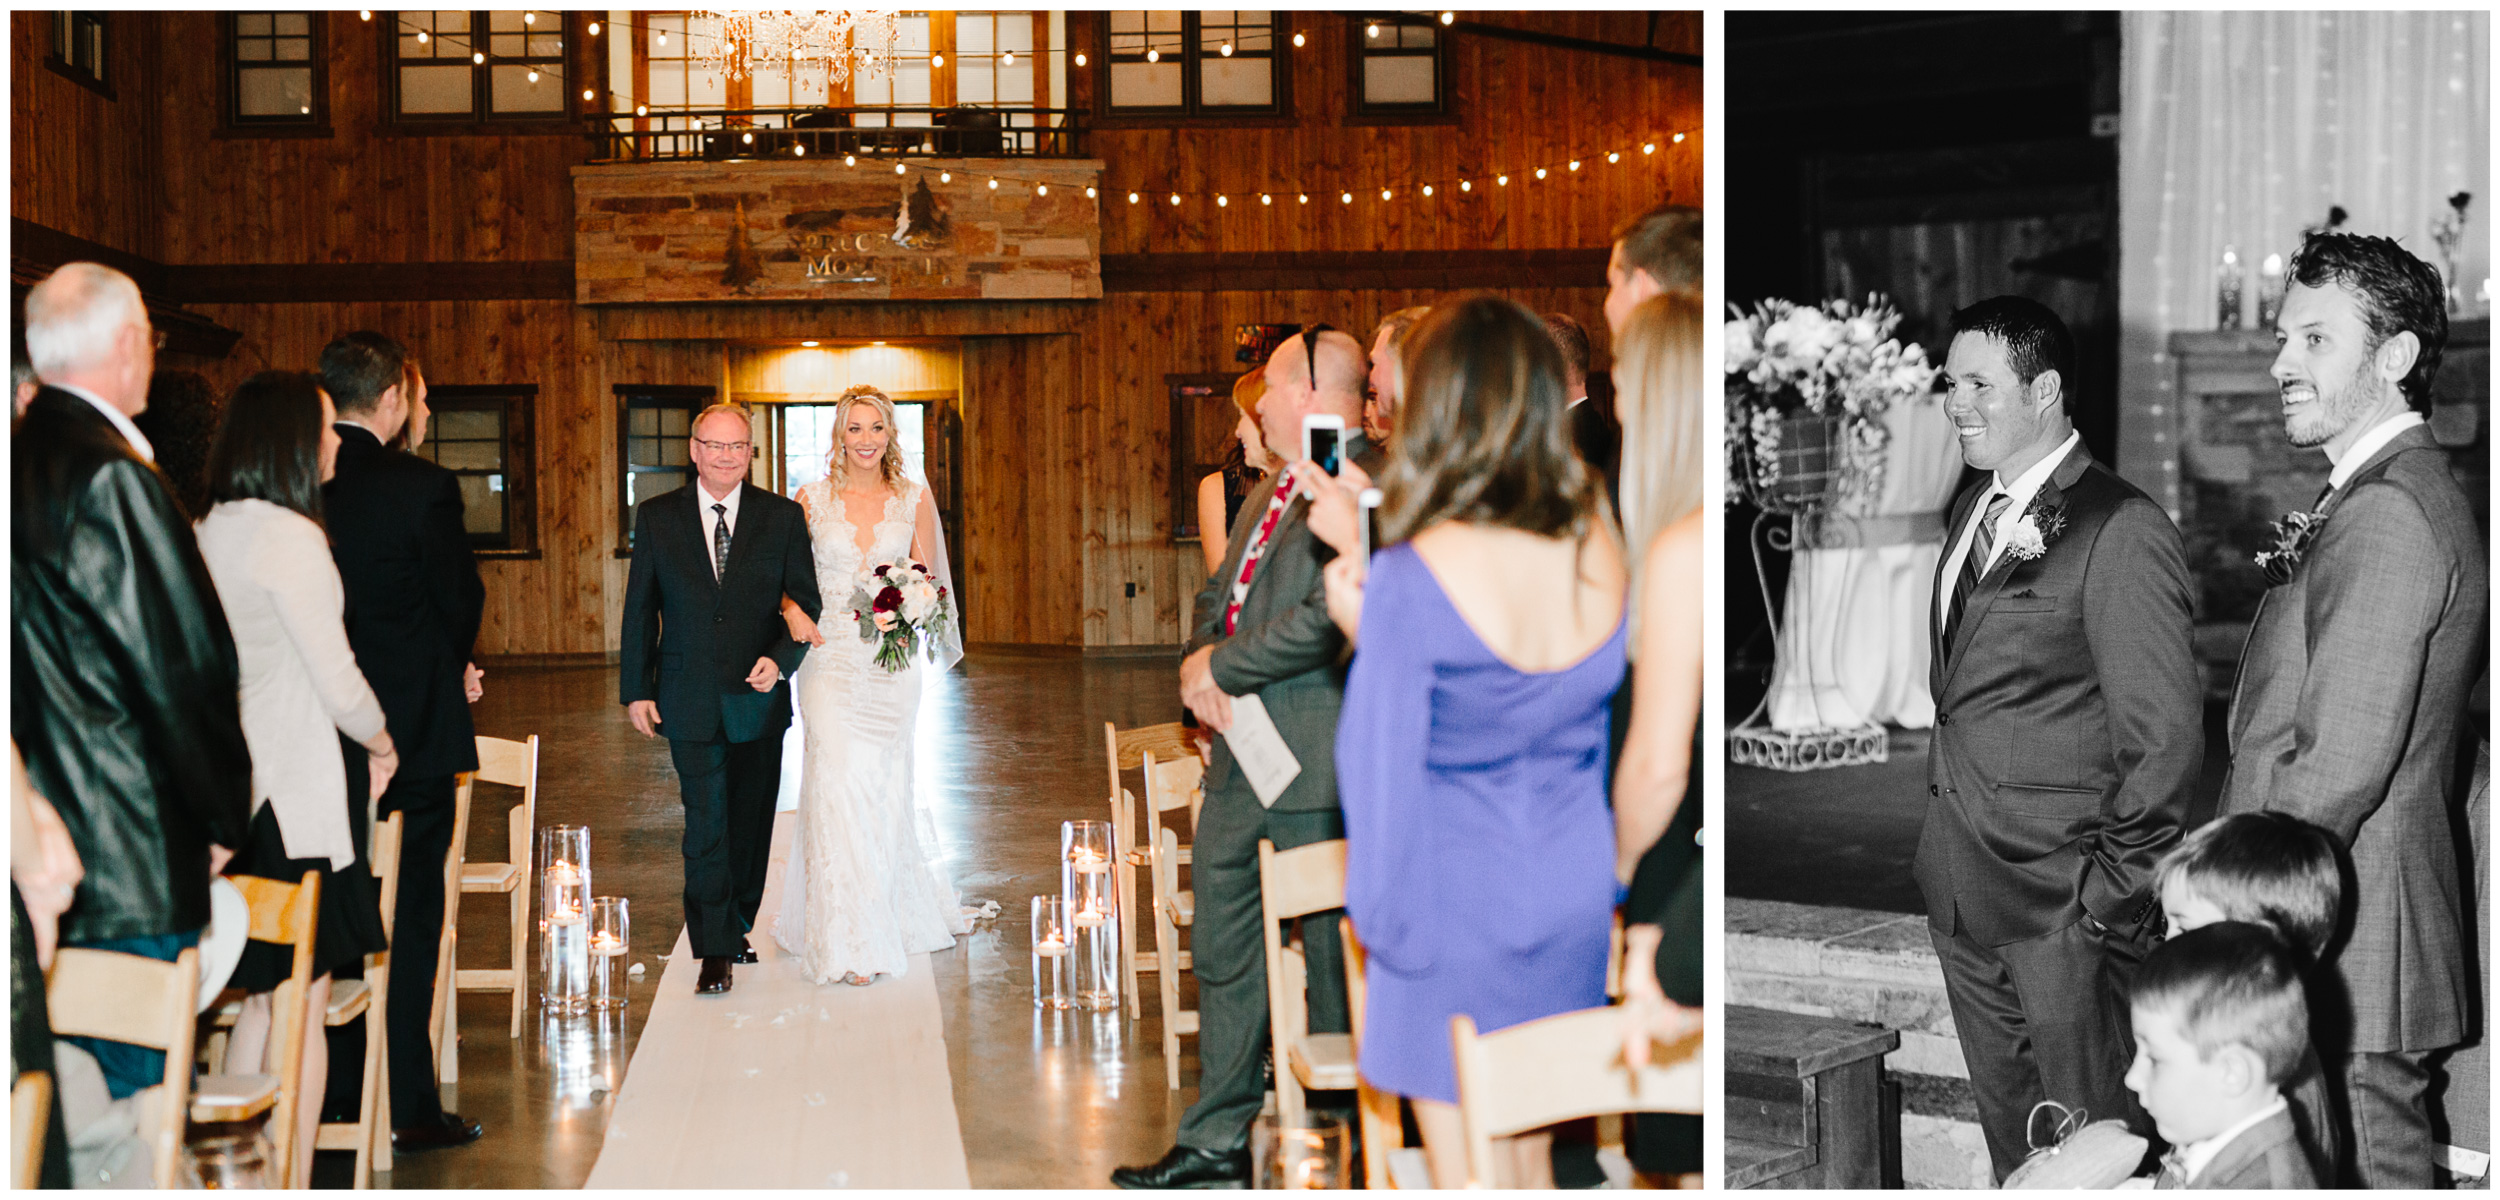 spruce_mountain_ranch_wedding_update.jpg